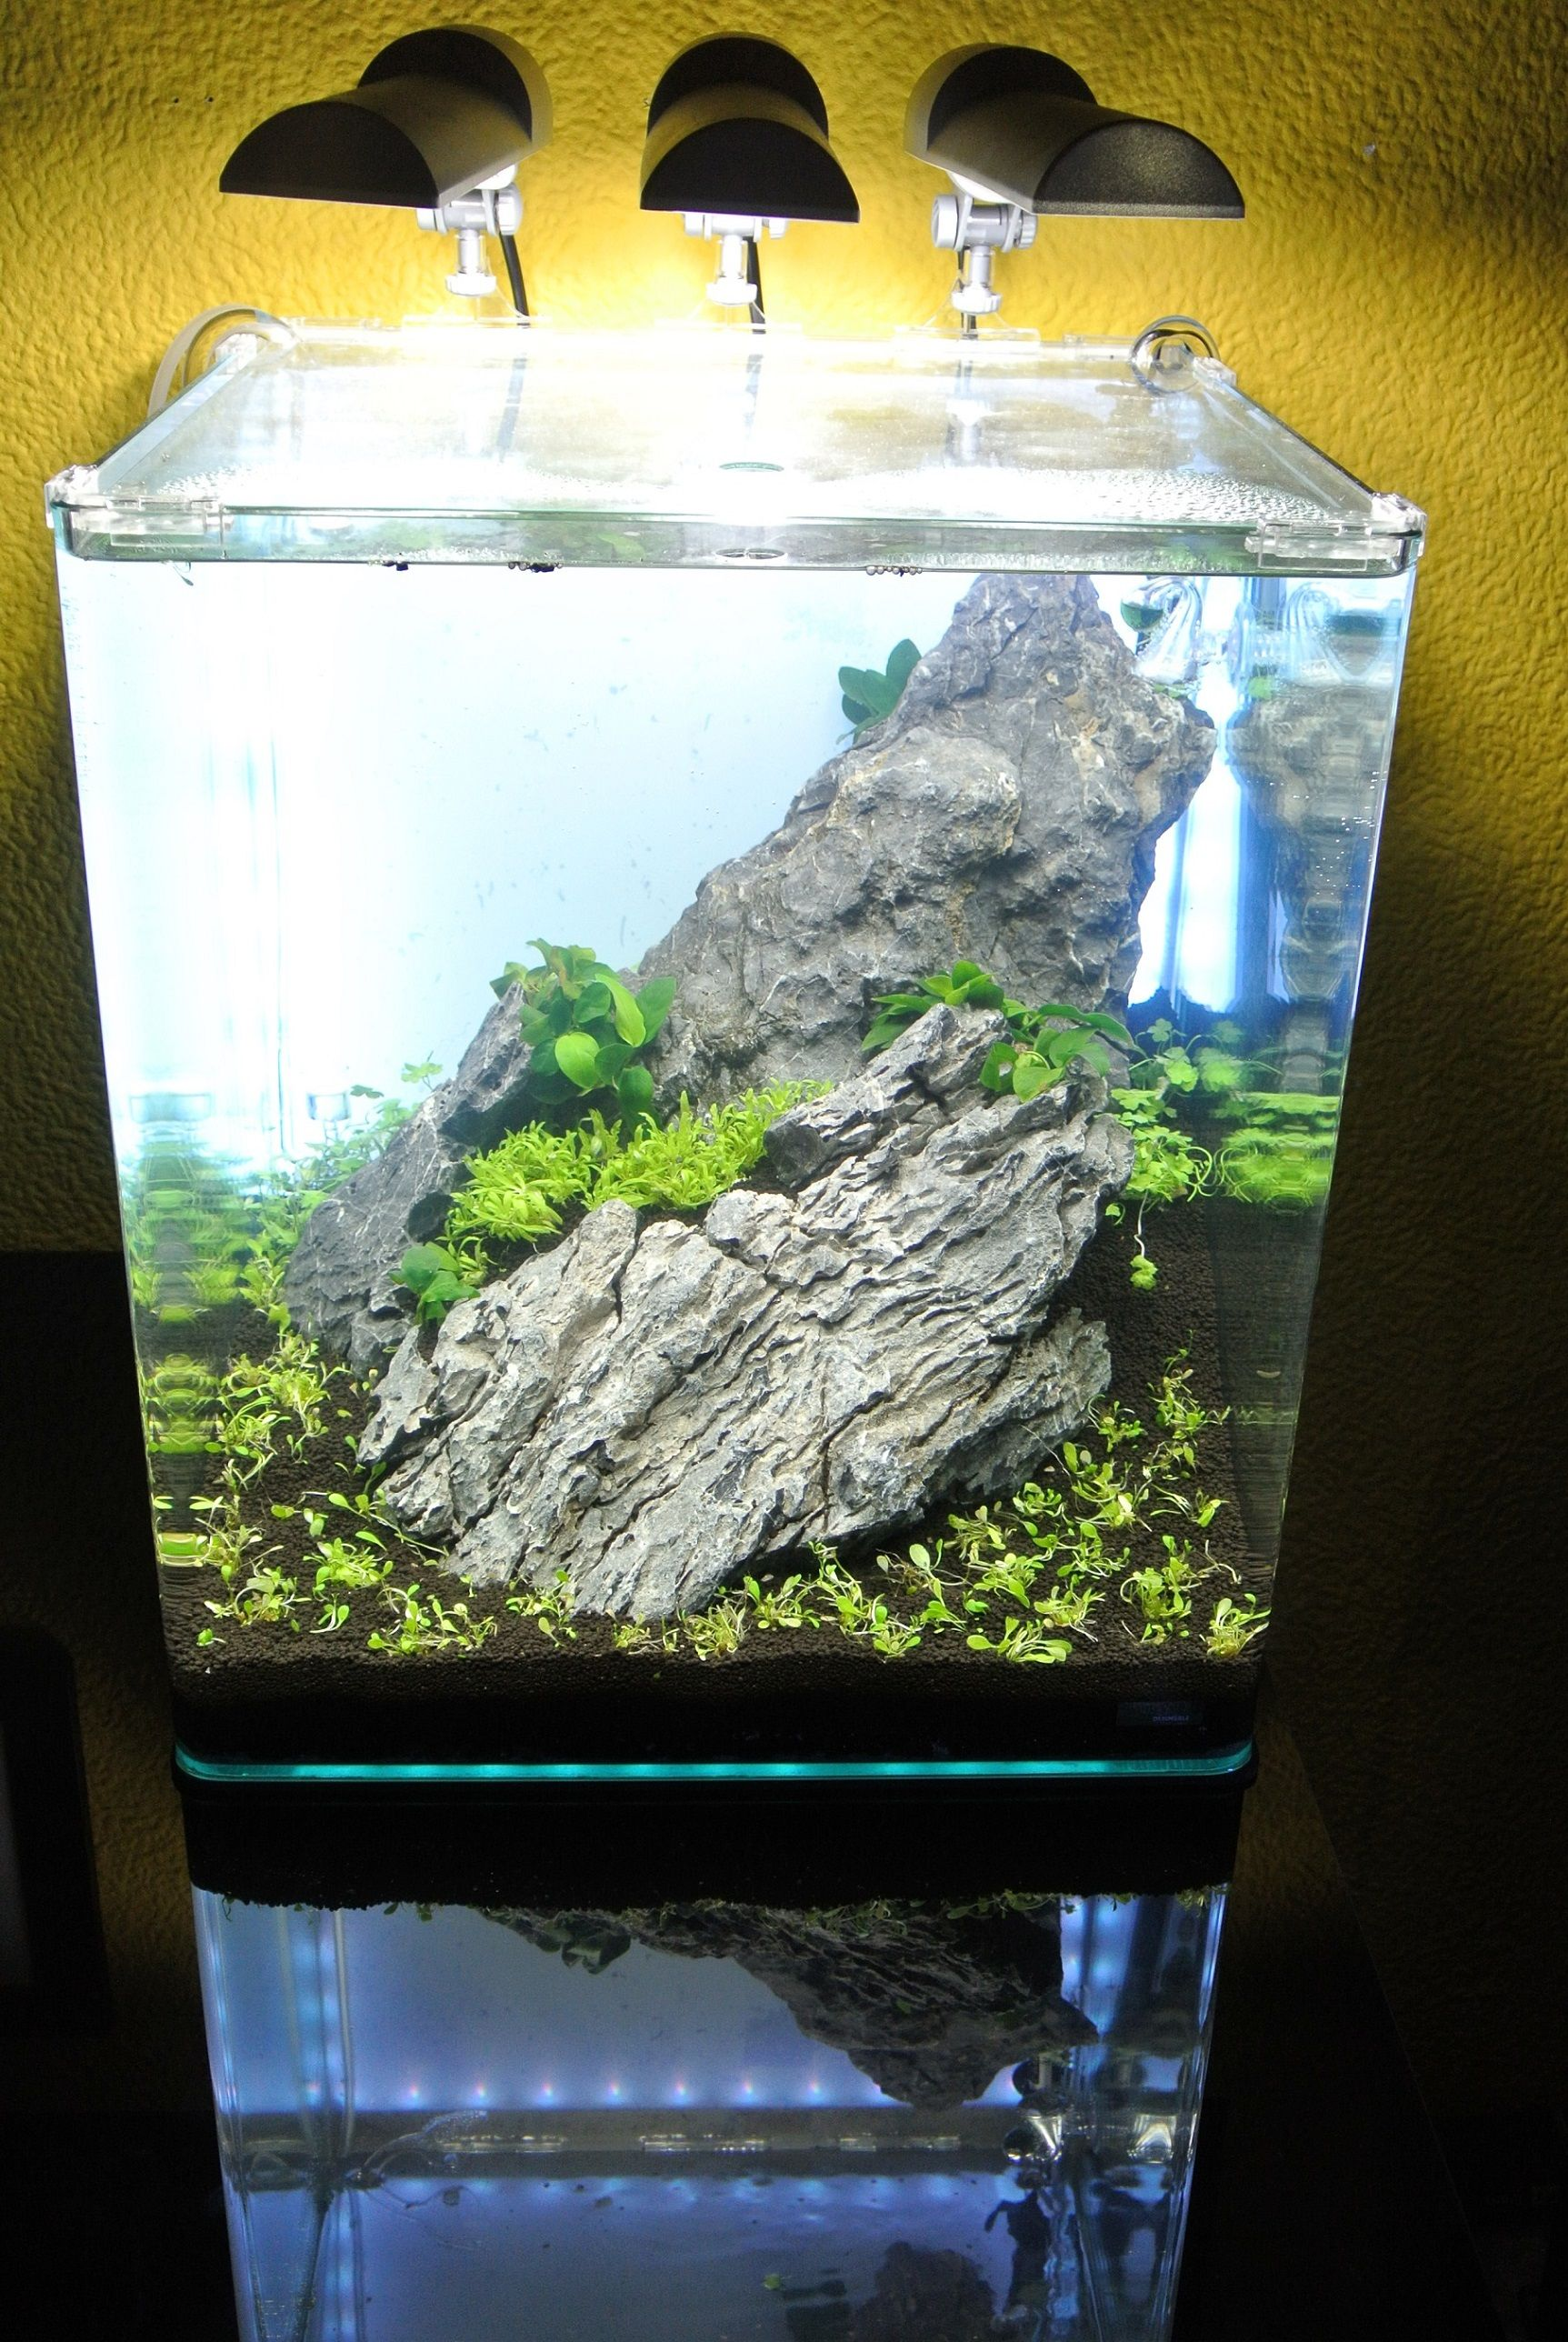 bildergebnis f r aquascaping dennerle nano cube 60 l. Black Bedroom Furniture Sets. Home Design Ideas